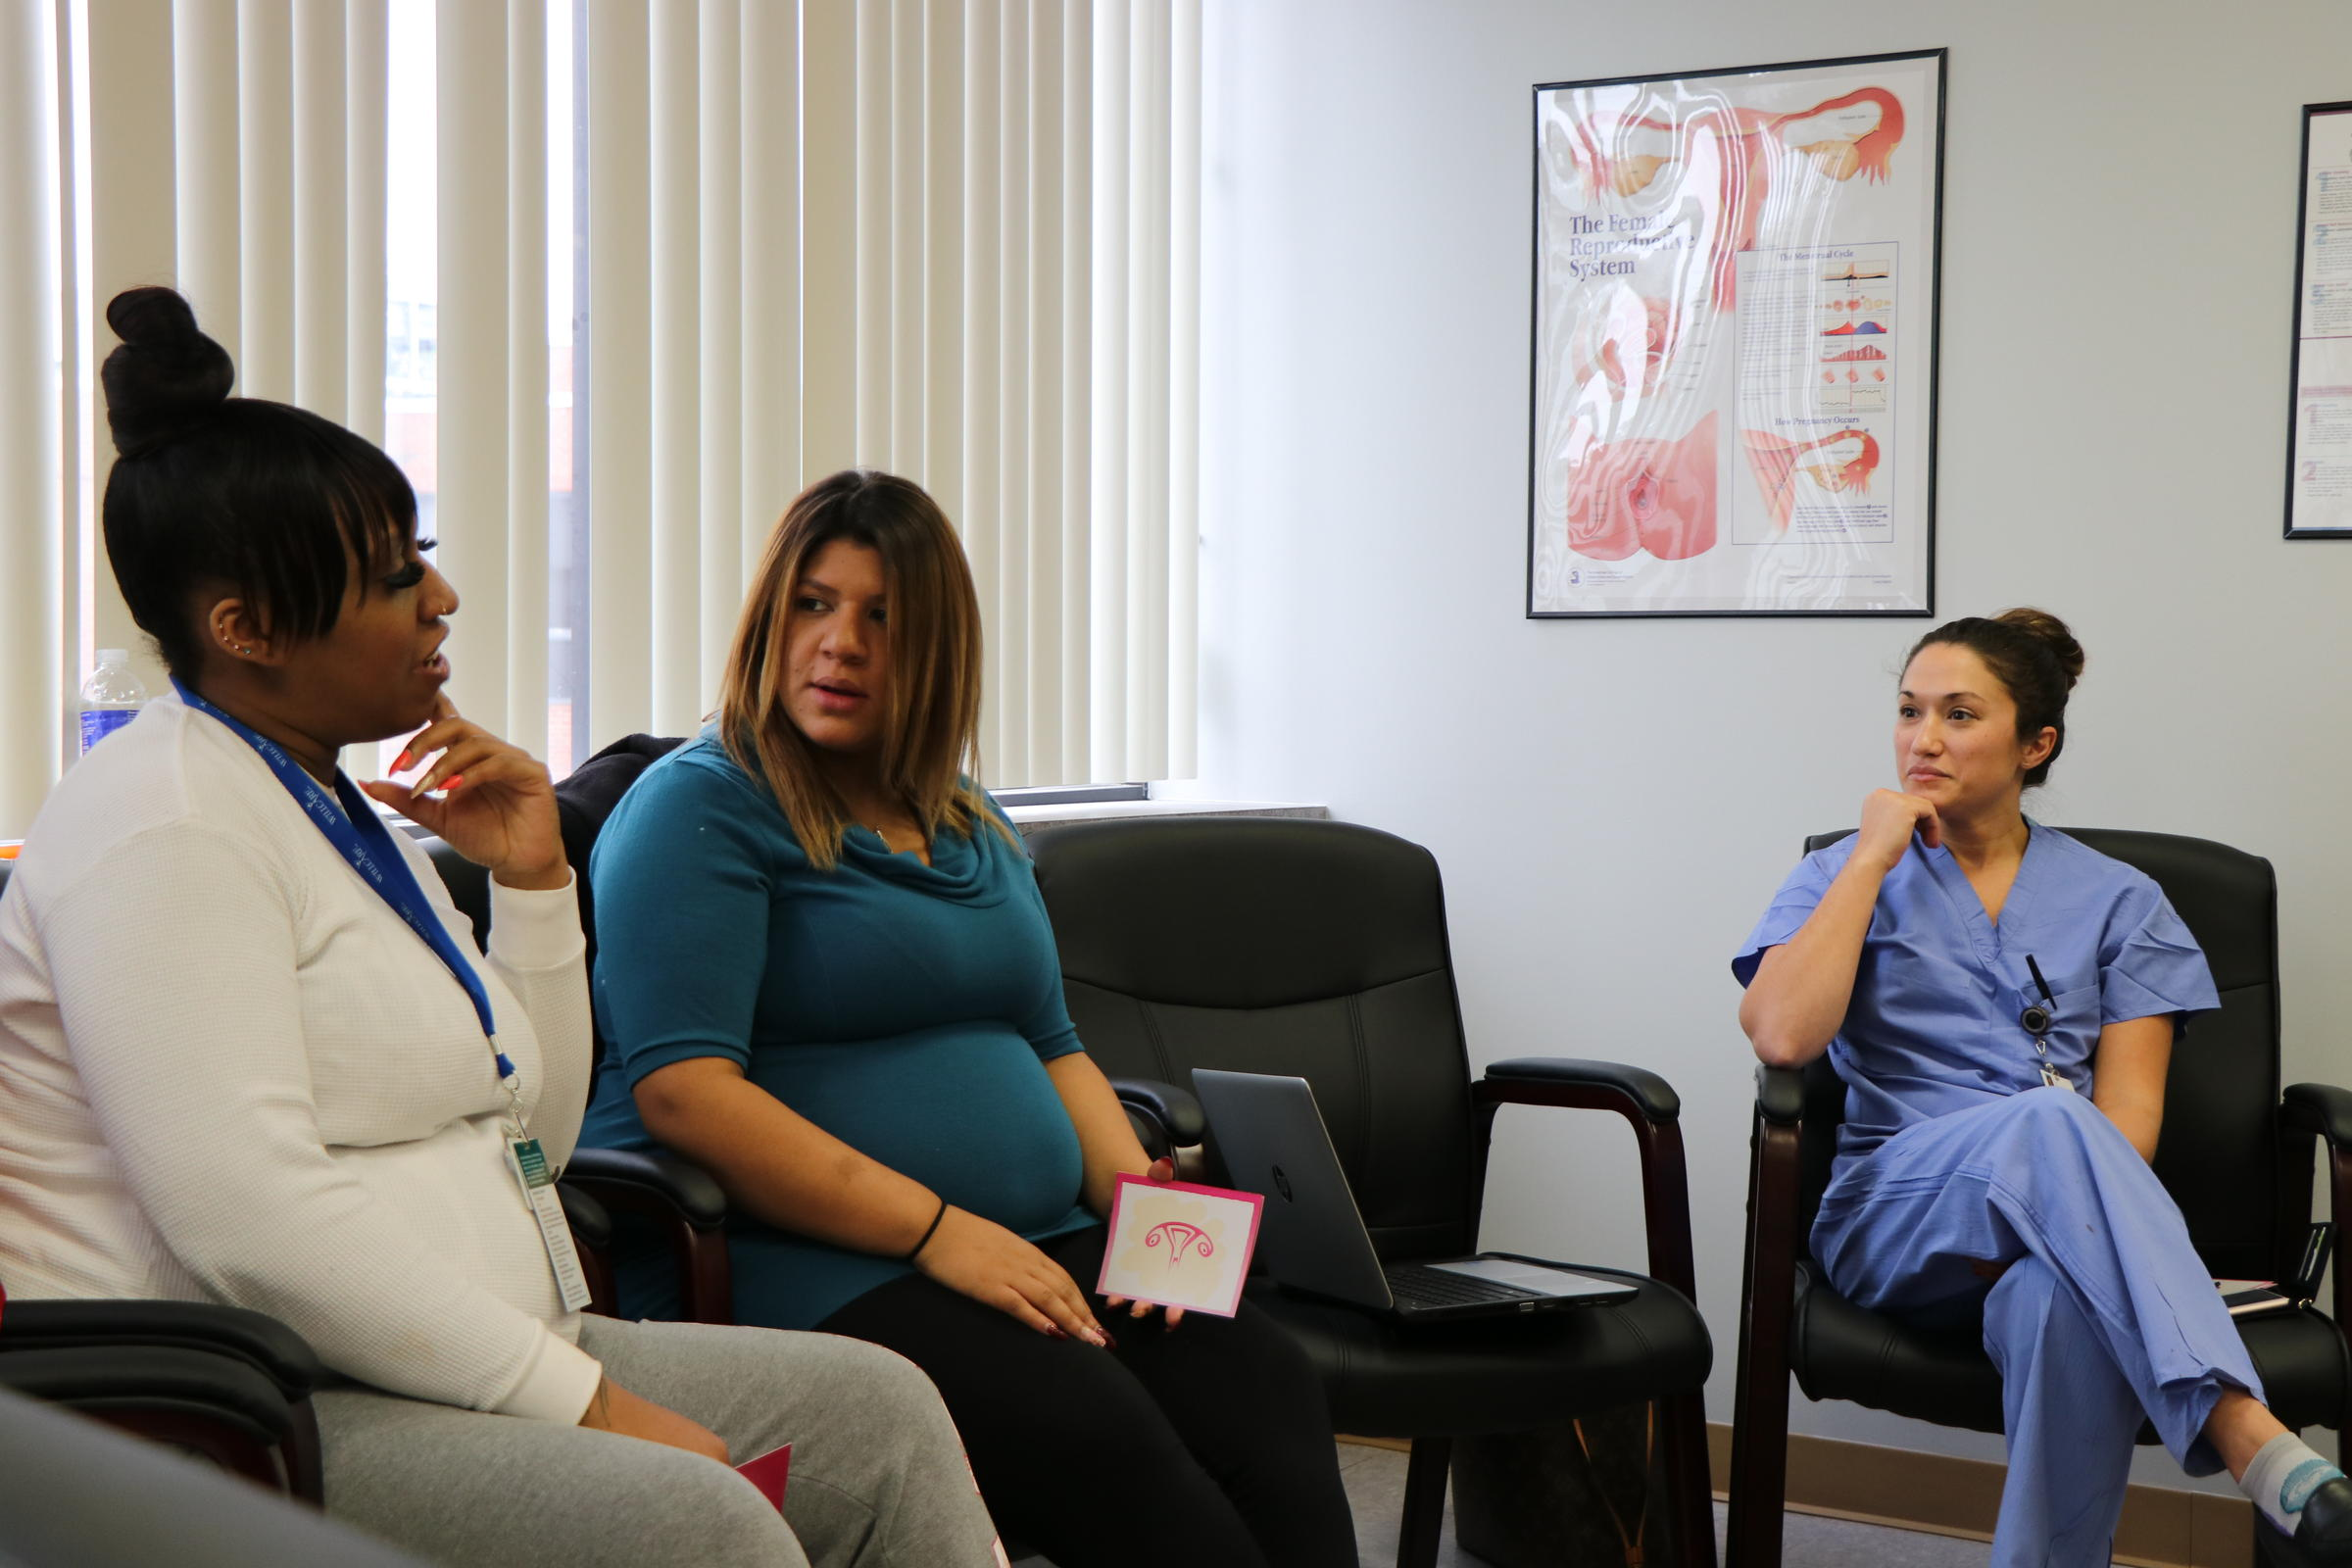 Empowerment And Shared Experience Are Keys To Niagara Falls Prenatal Care Program Wbfo